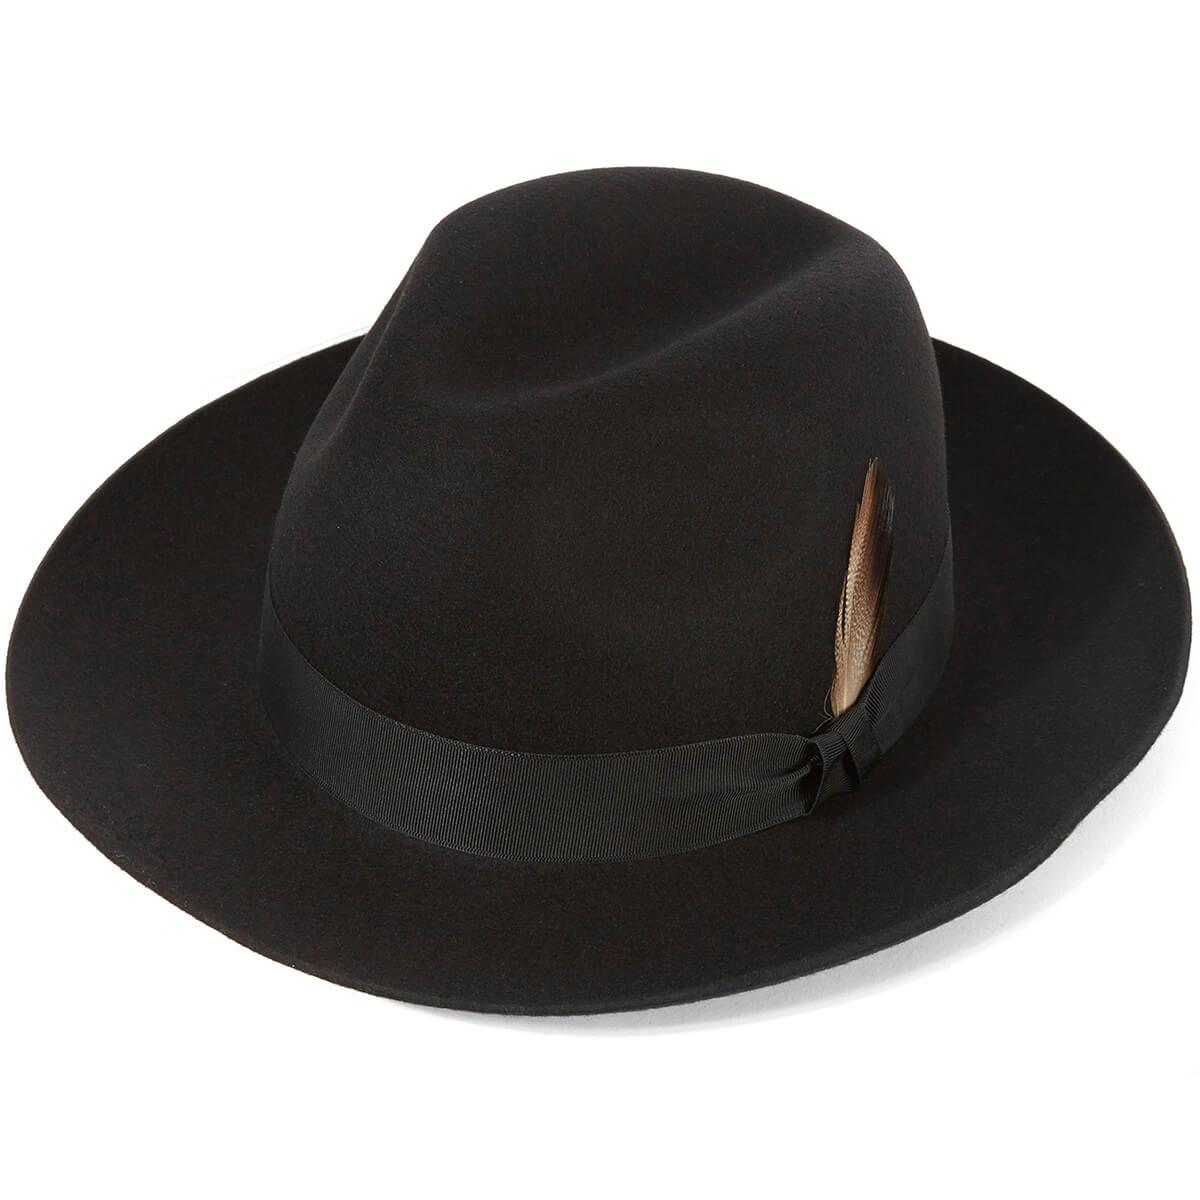 Grosvenor Fedora Hat - Black in size 58